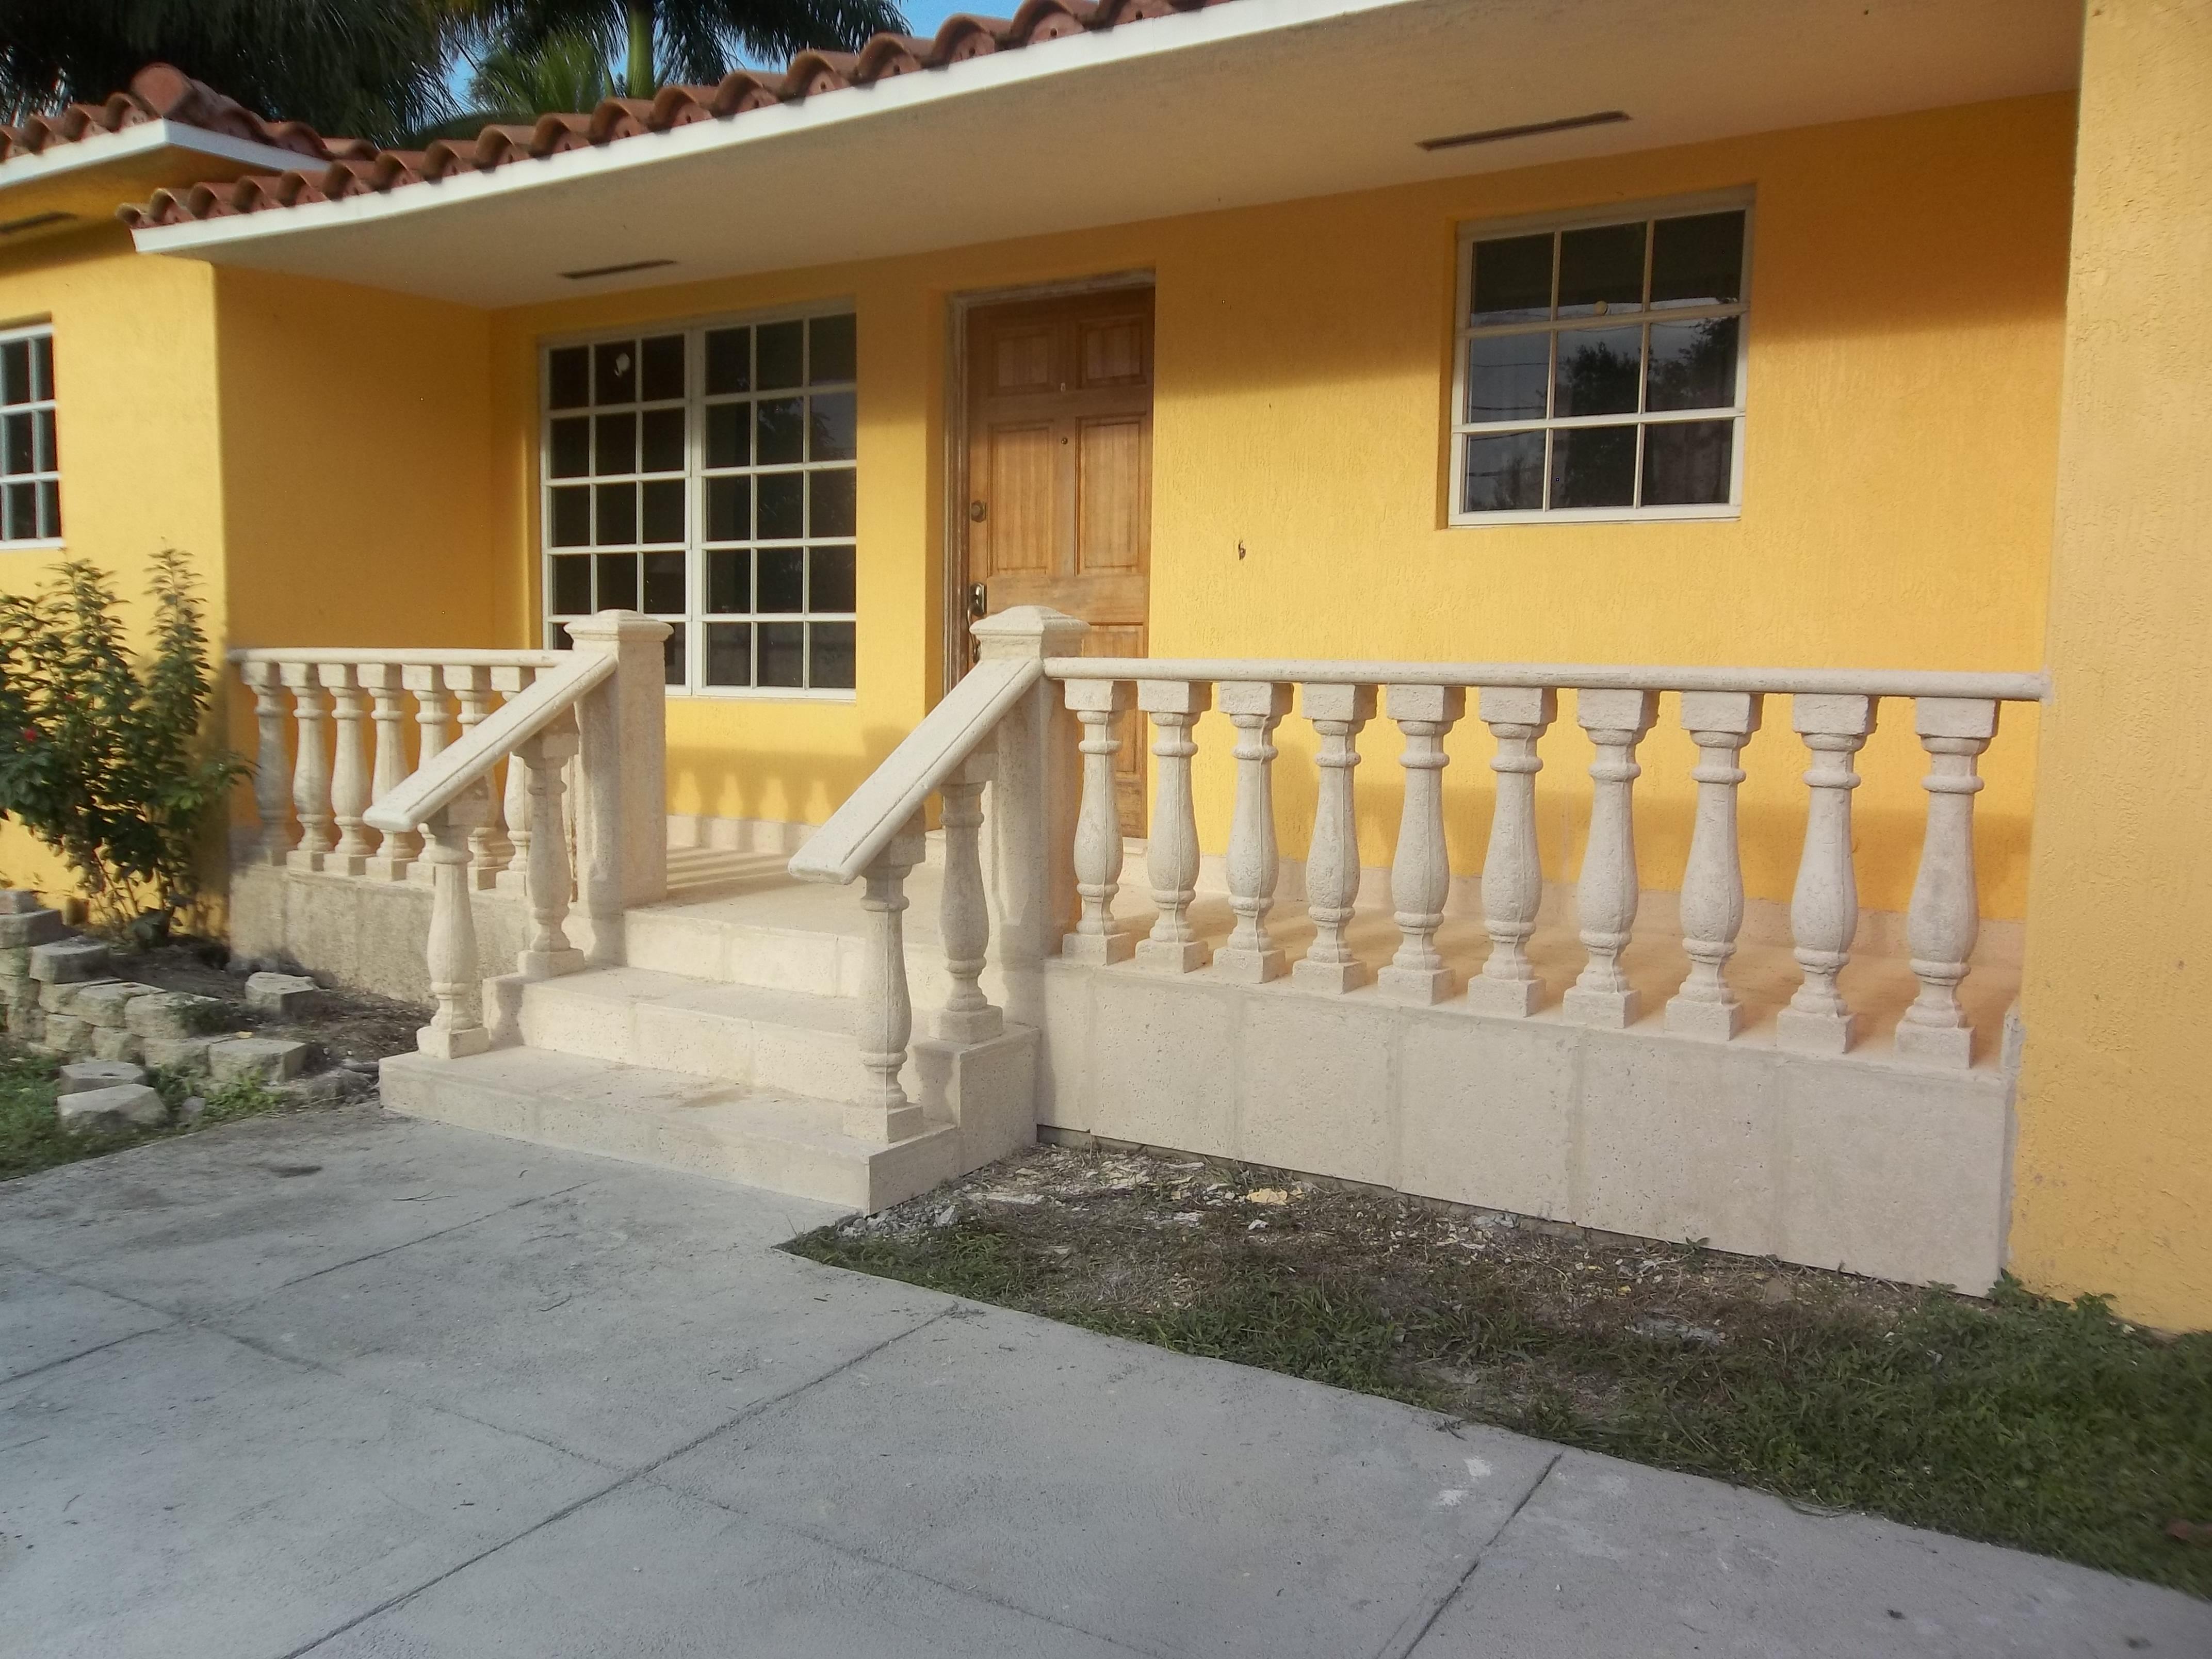 Handrails.